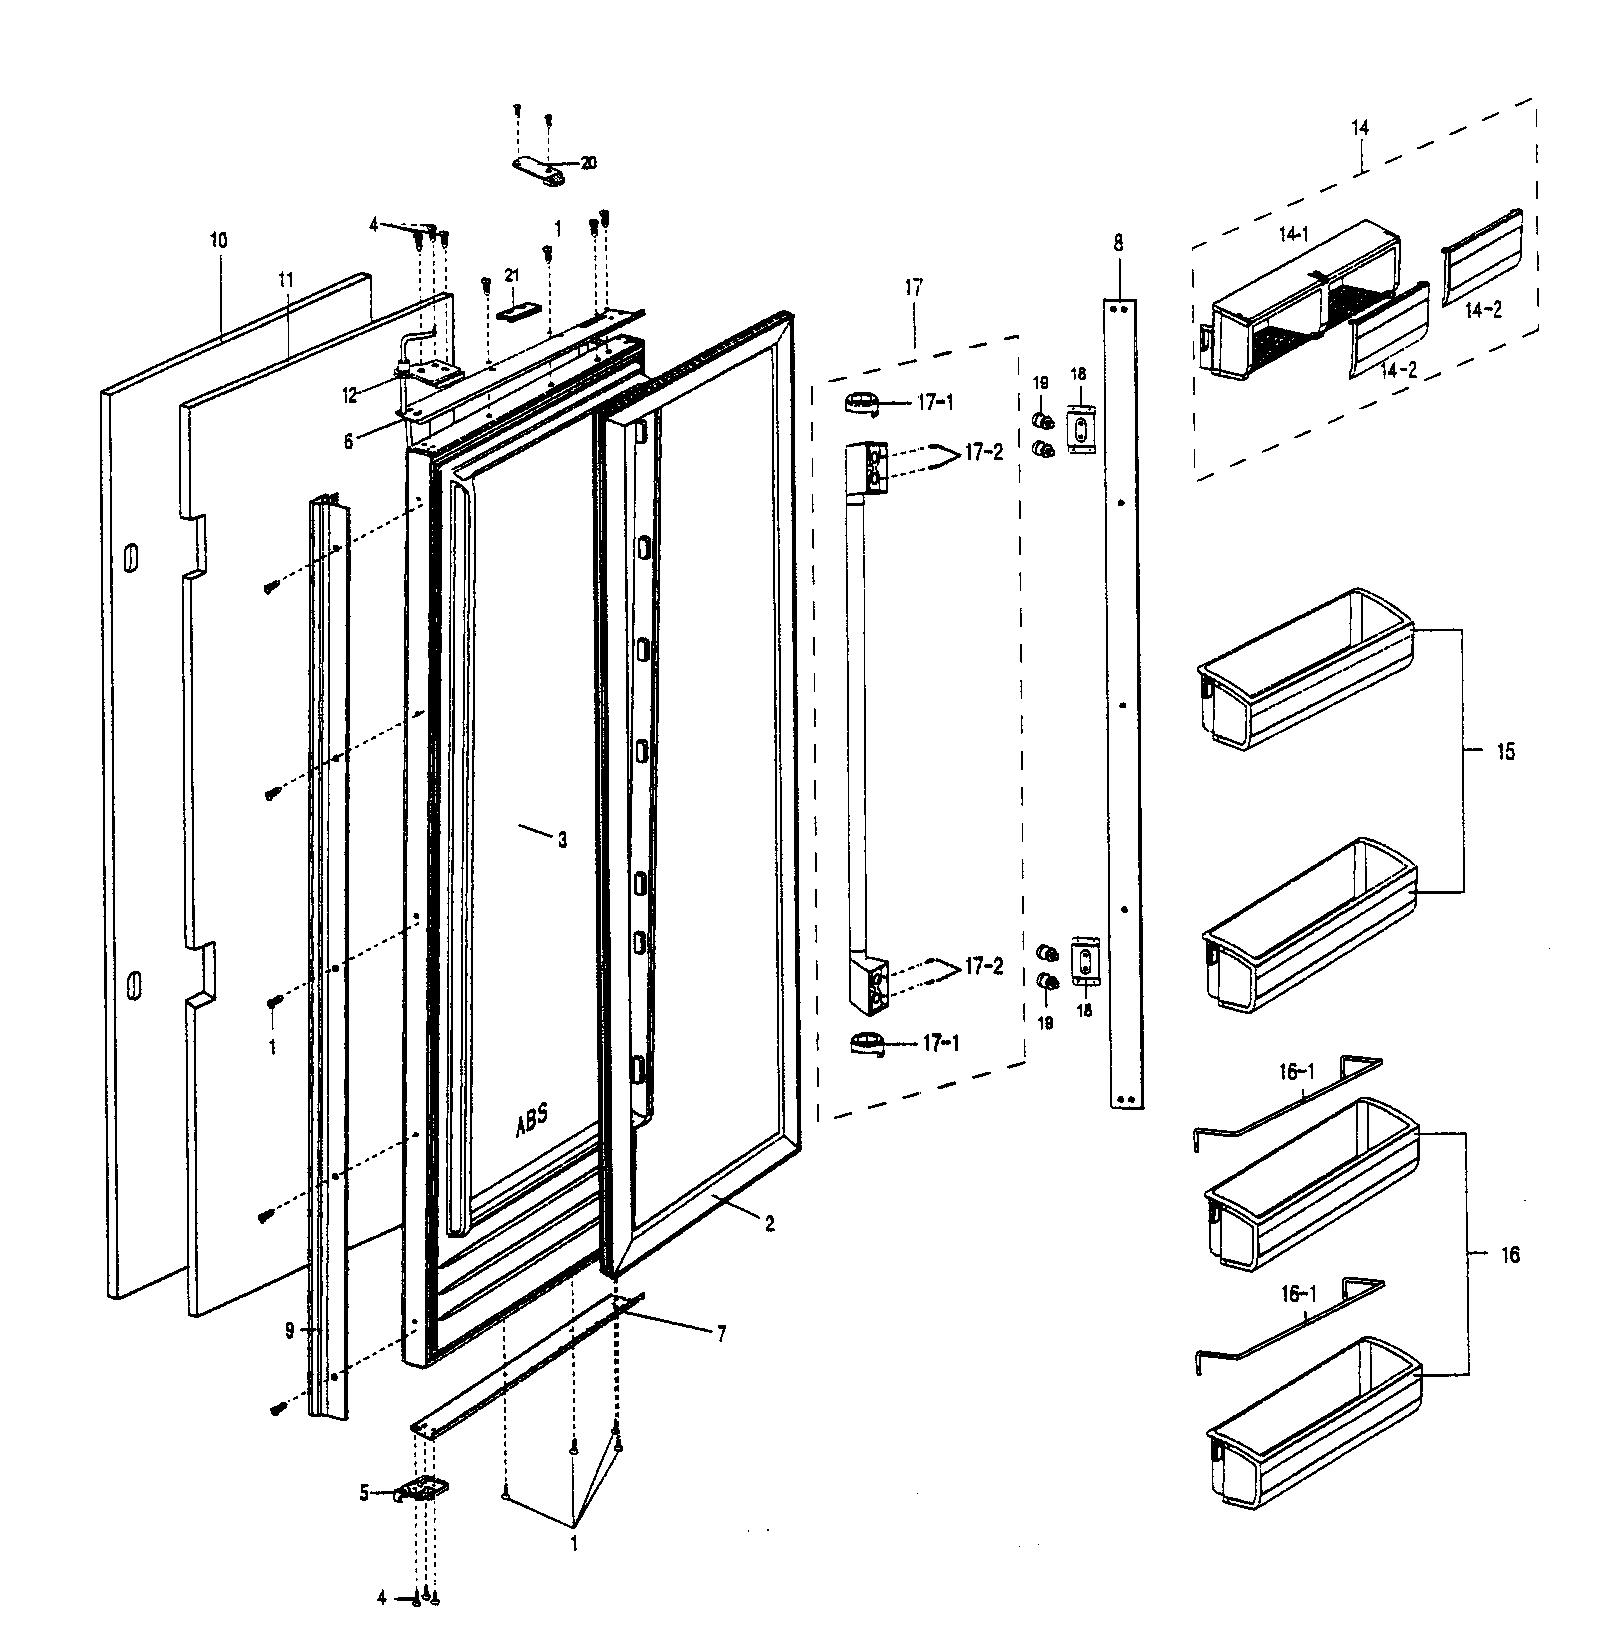 ge cafe refrigerator wiring diagram led strobe light circuit gfss6kkycss mod fridge library